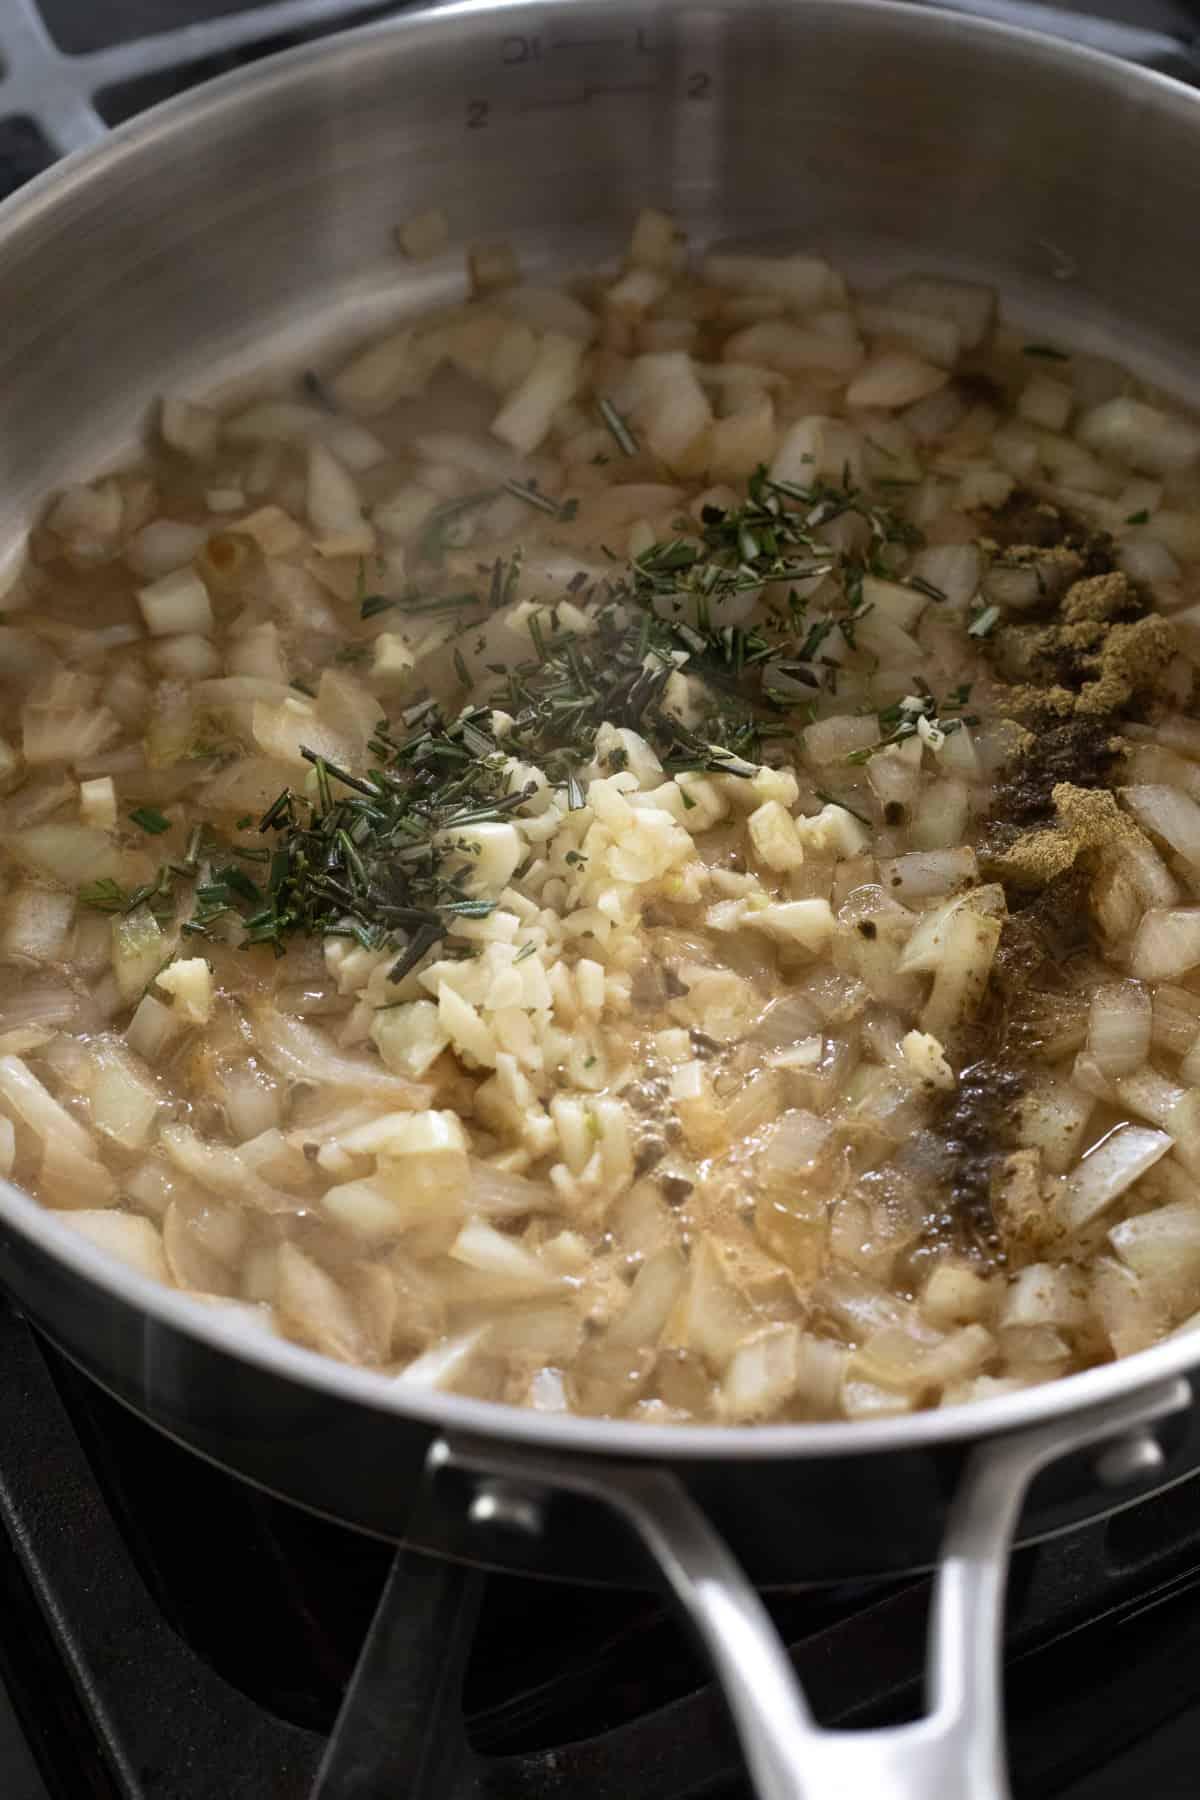 sautéing onion, garlic and herbs